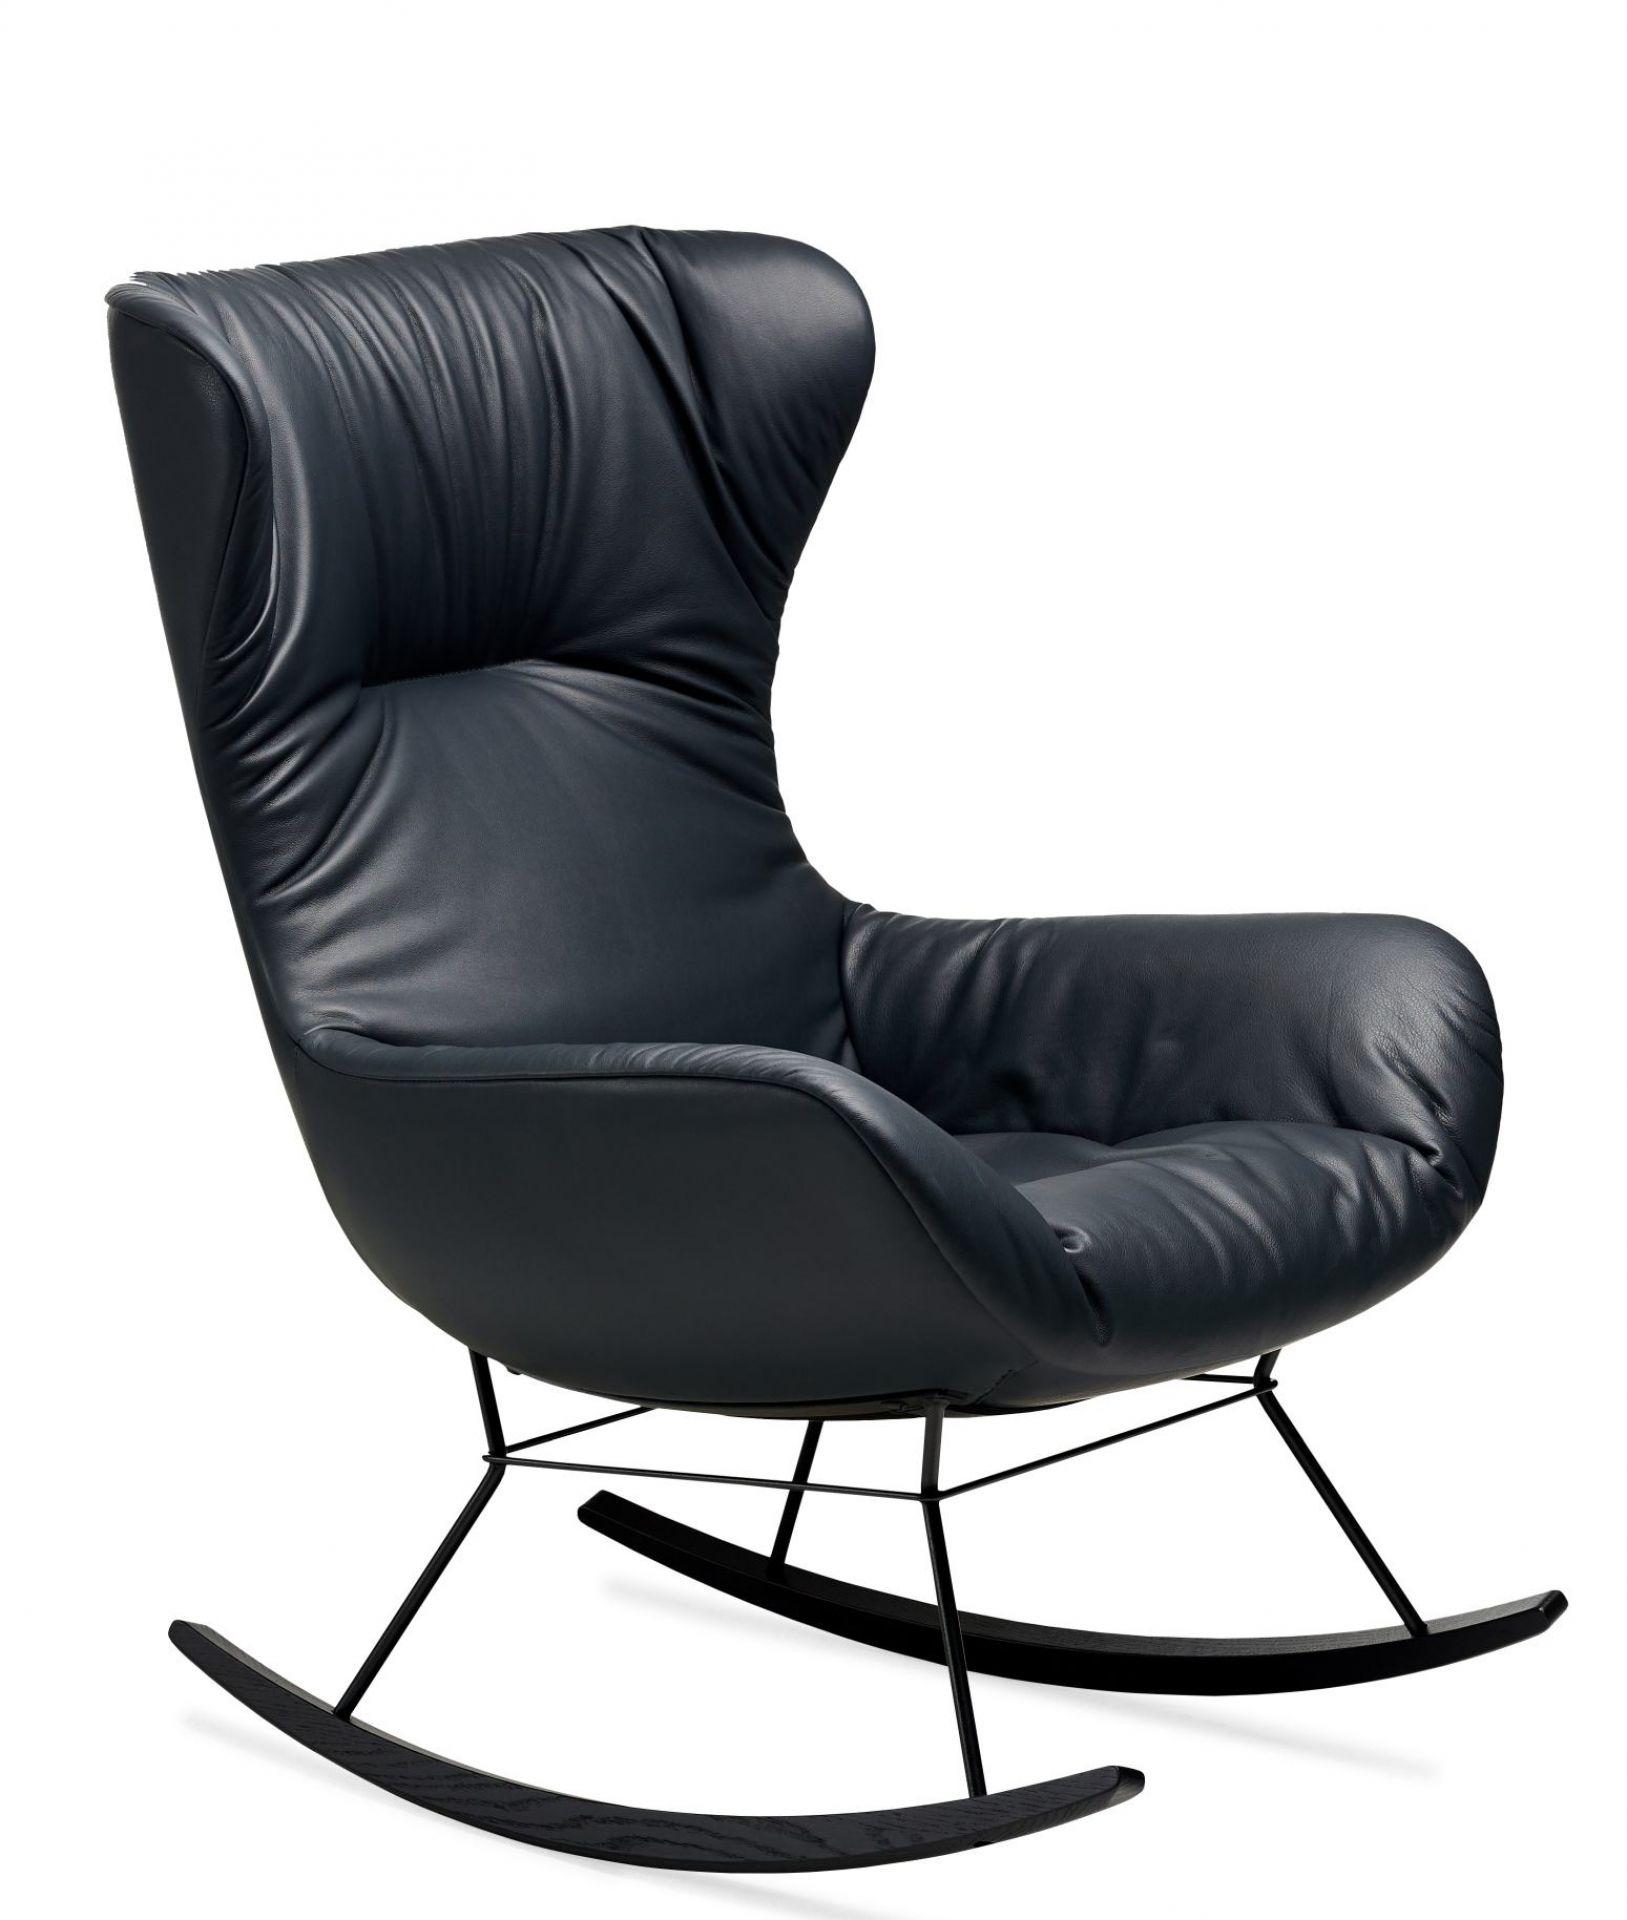 Leya Rocking Wingback Chair Schaukelstuhl Freifrau Sitzmöbelmanufaktur